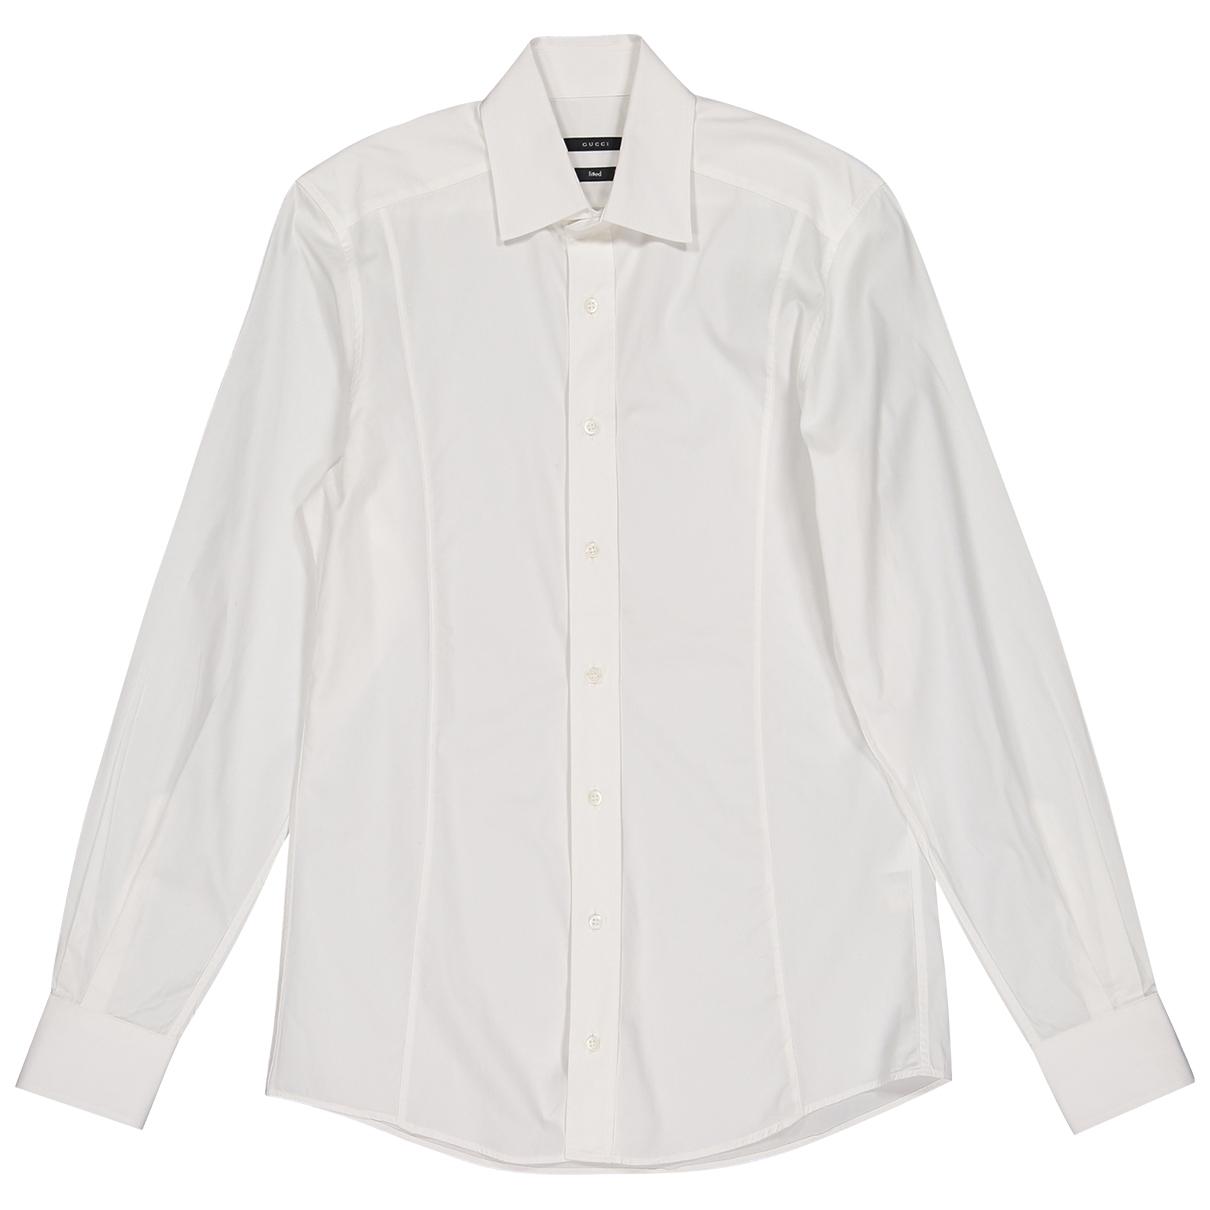 Gucci \N White Cotton Shirts for Men 38 EU (tour de cou / collar)